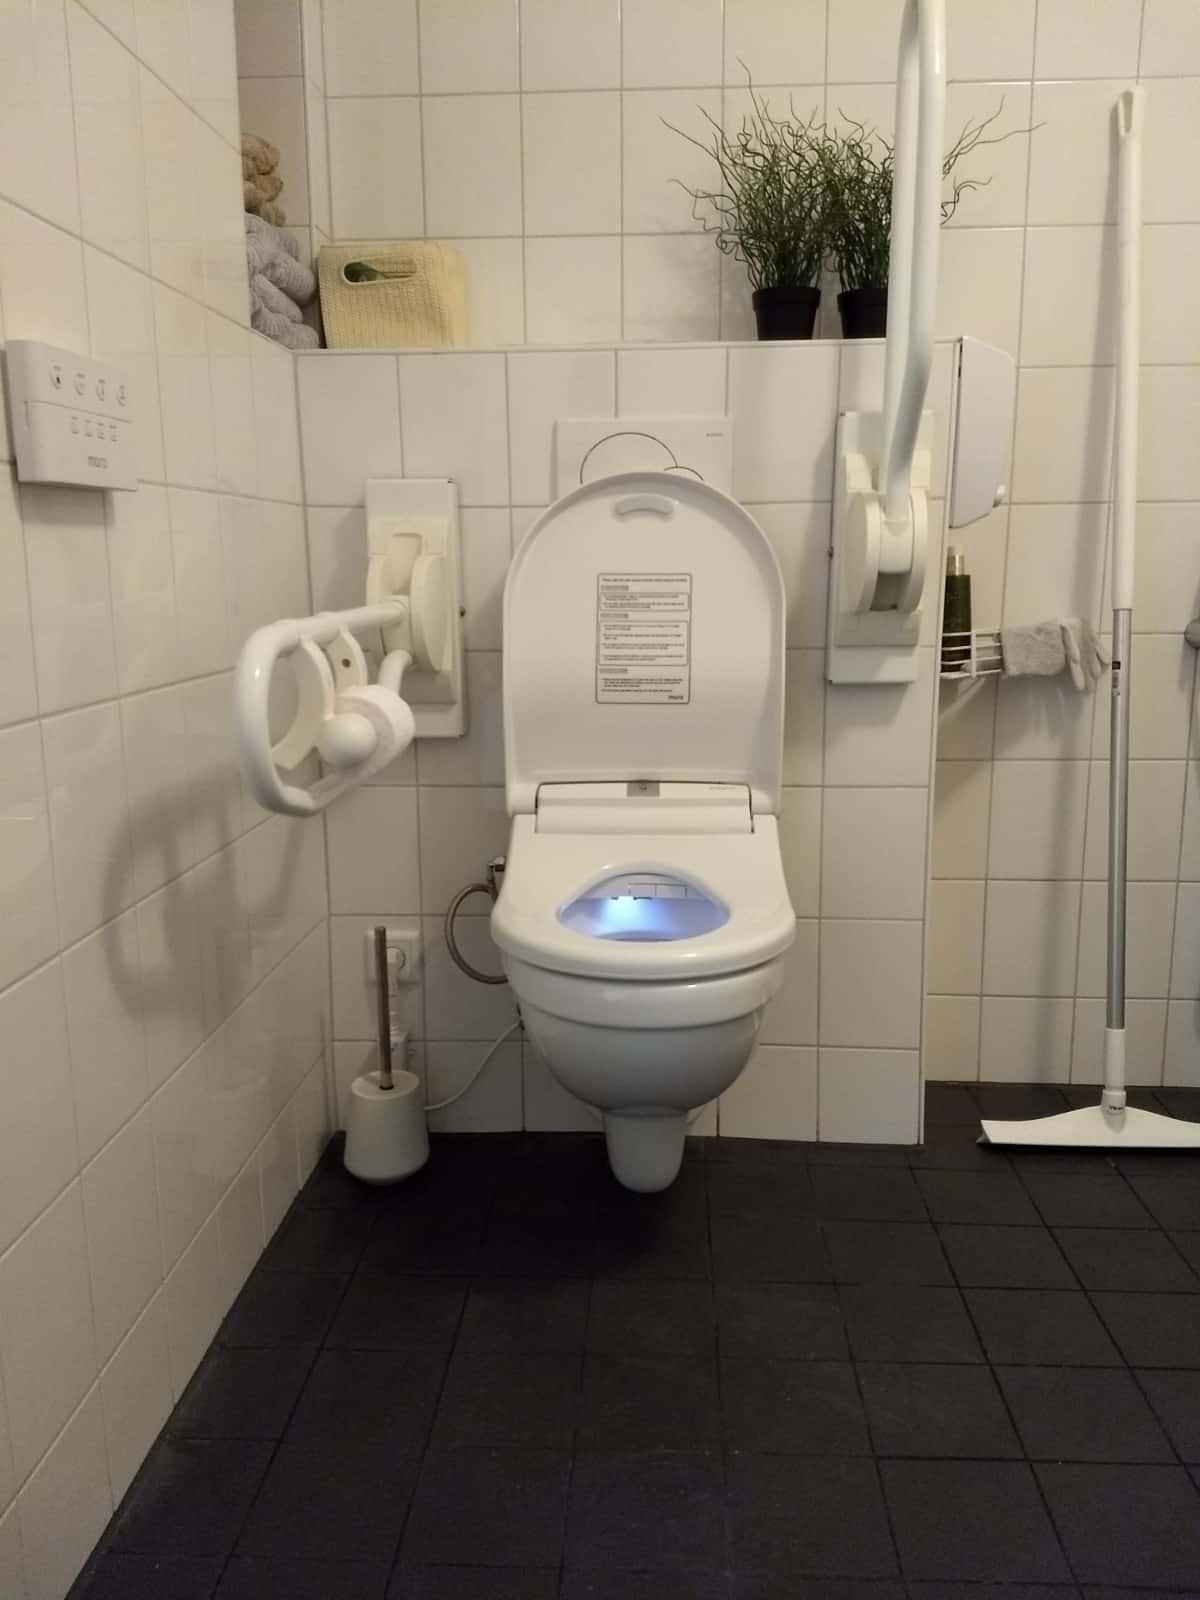 Installatie Maro DI600 douchewc badkamer